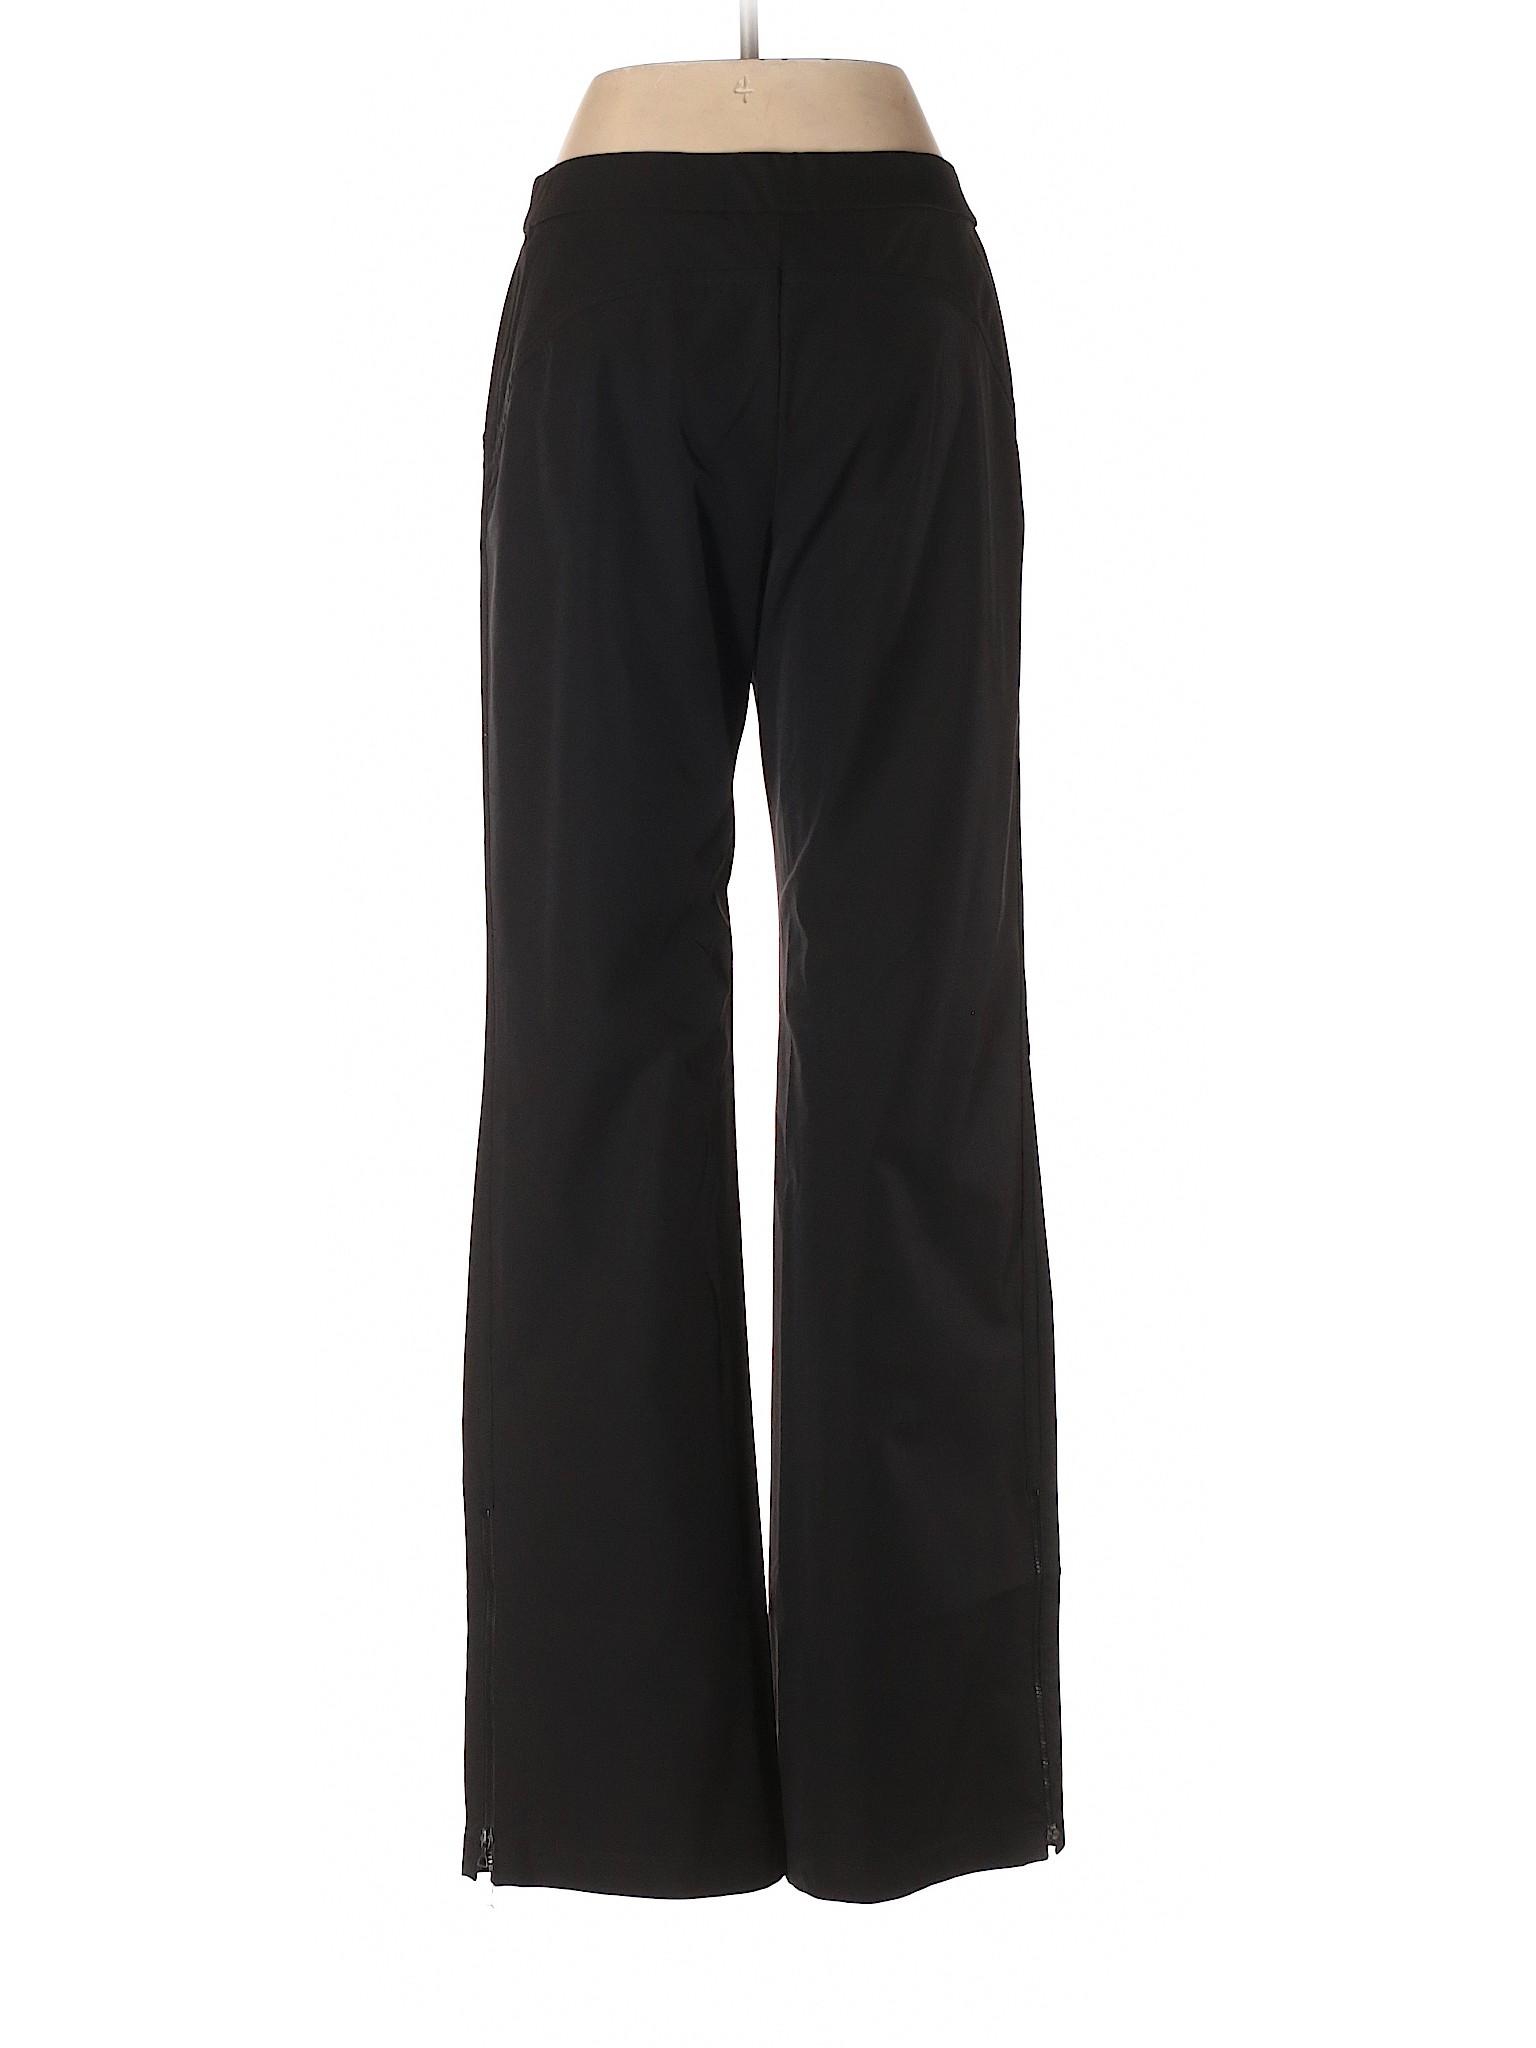 Dana Dress Pants Dana Buchman Dana Buchman Dress Pants Boutique Boutique Buchman Boutique pXwwnxIFqd